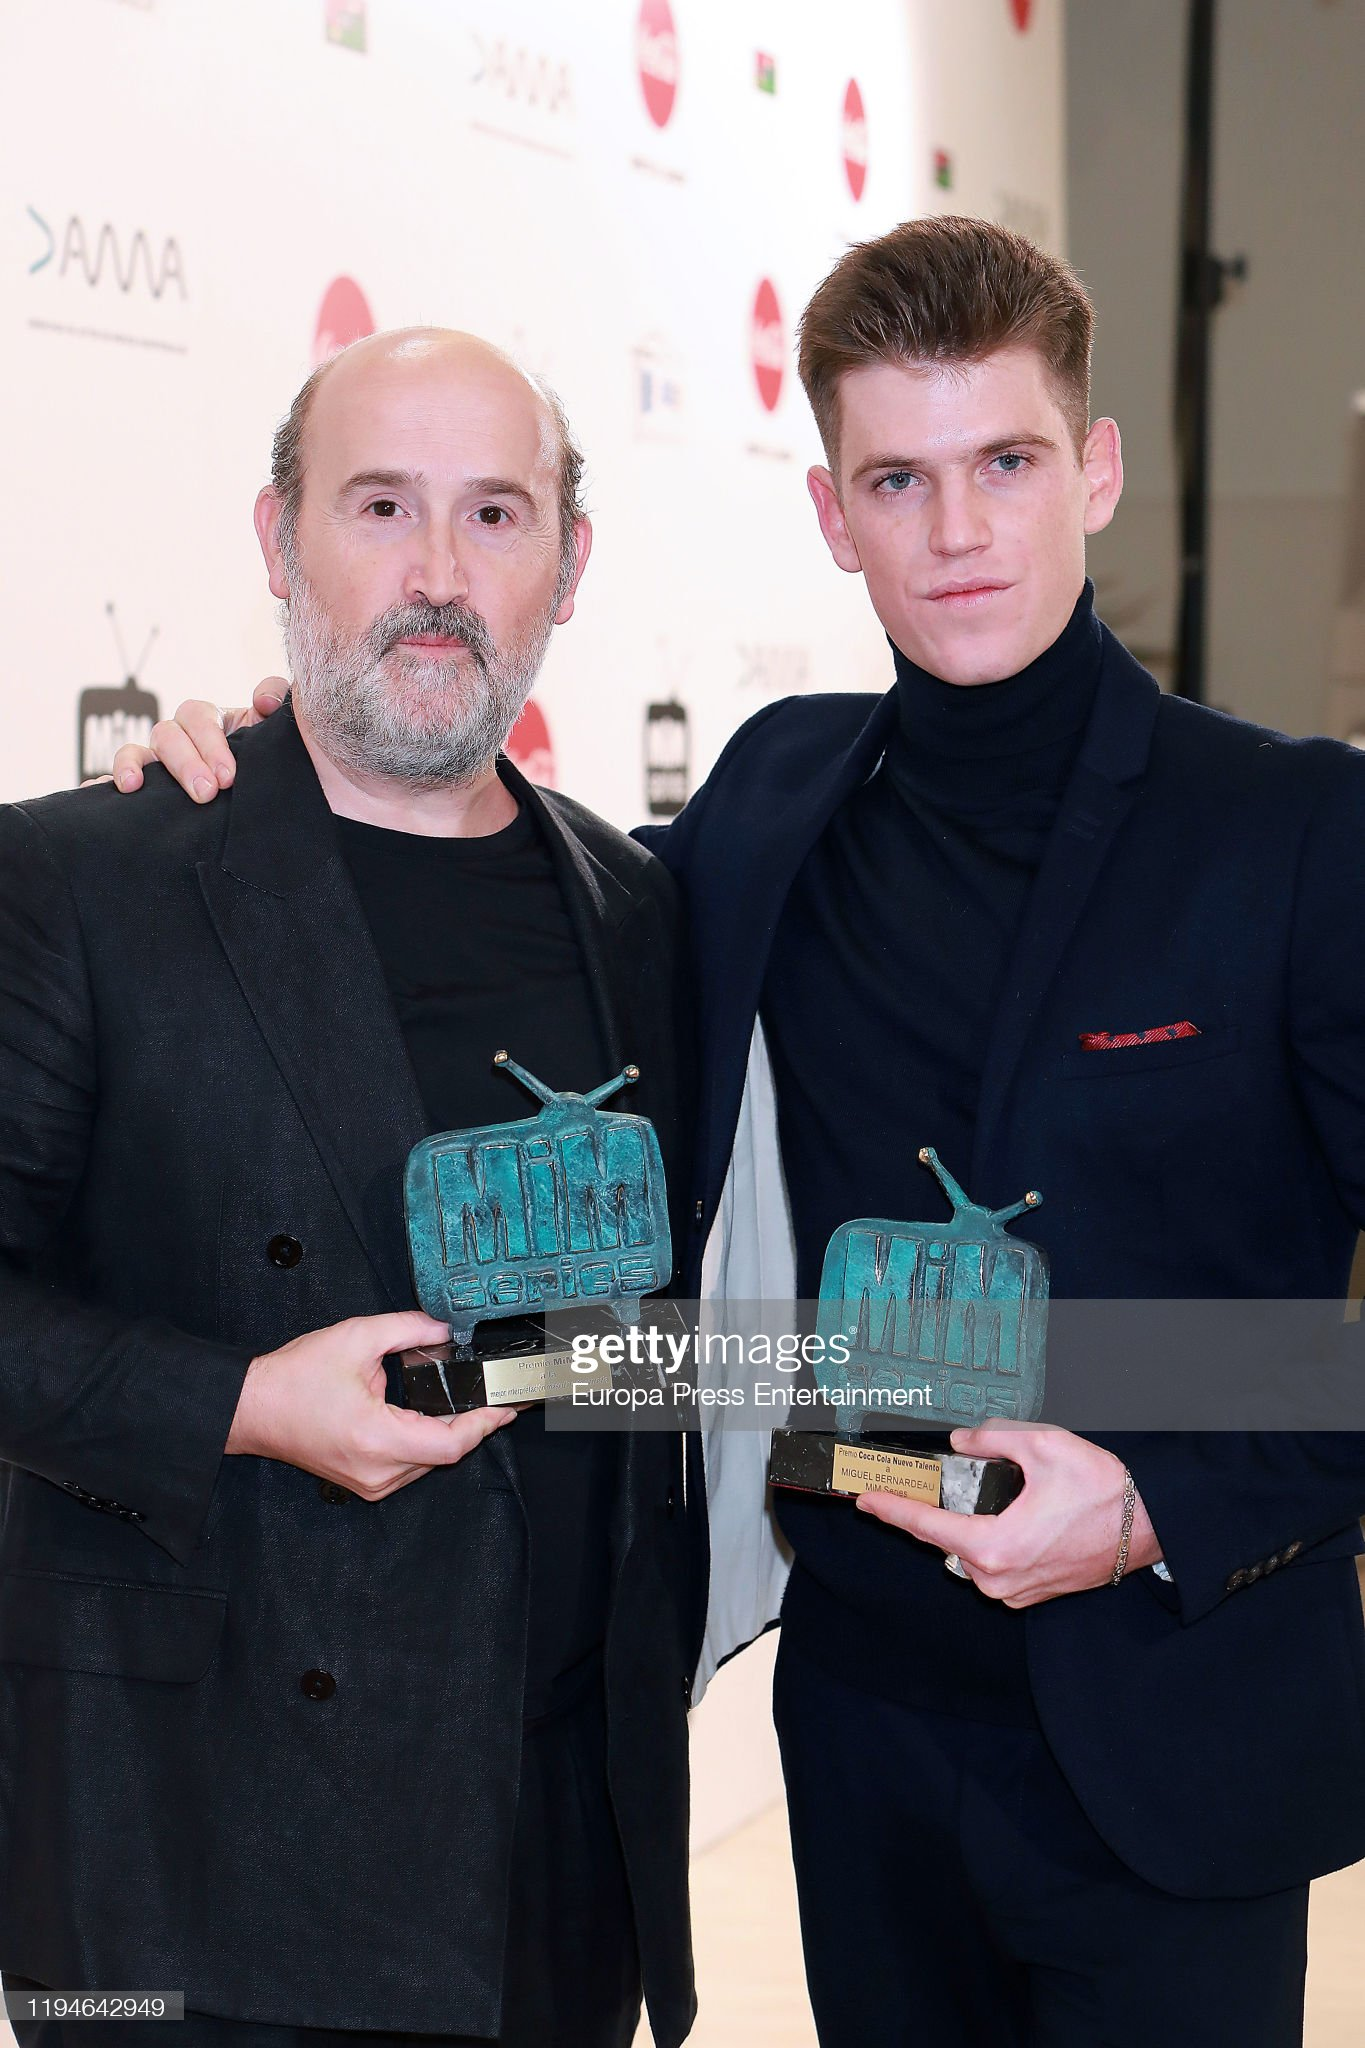 ¿Cuánto mide Miguel Bernardeau?  - Altura: 1,79 Javier-camara-and-miguel-bernardeau-attend-mim-awards-2019-at-hotel-picture-id1194642949?s=2048x2048